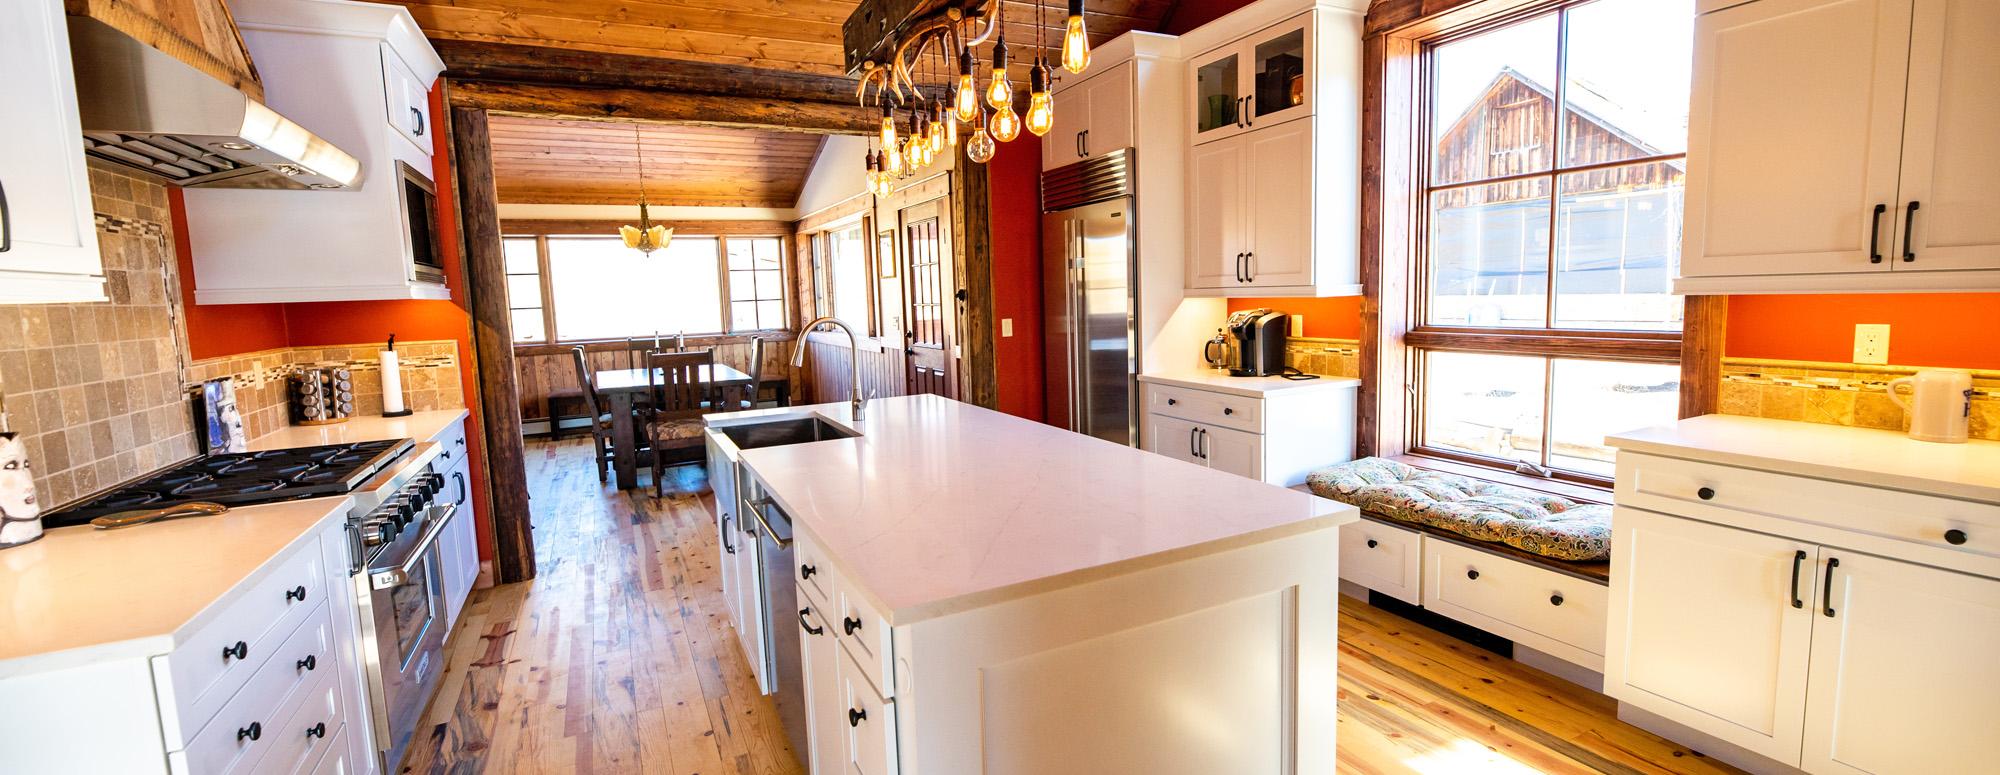 Creative Custom Cabinetry